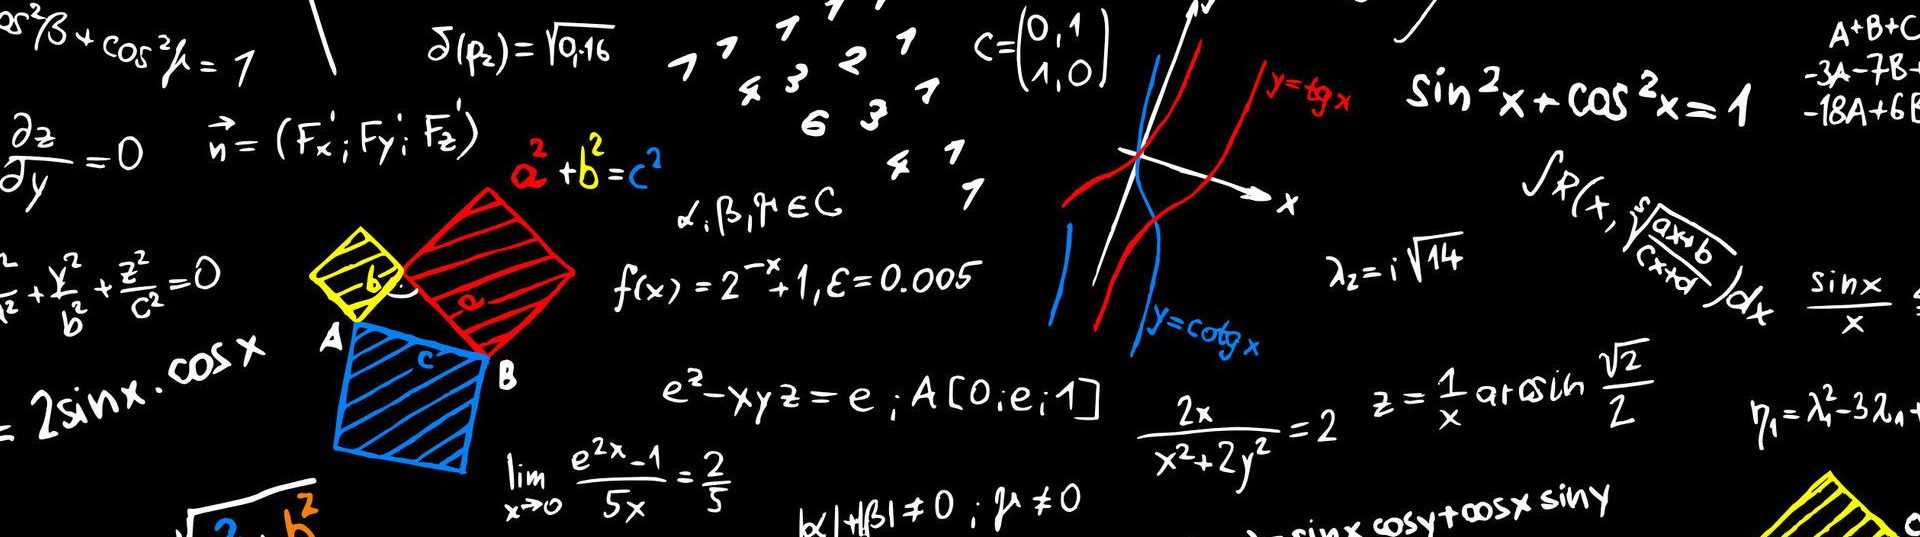 Math 131 Calculus 1 Resources